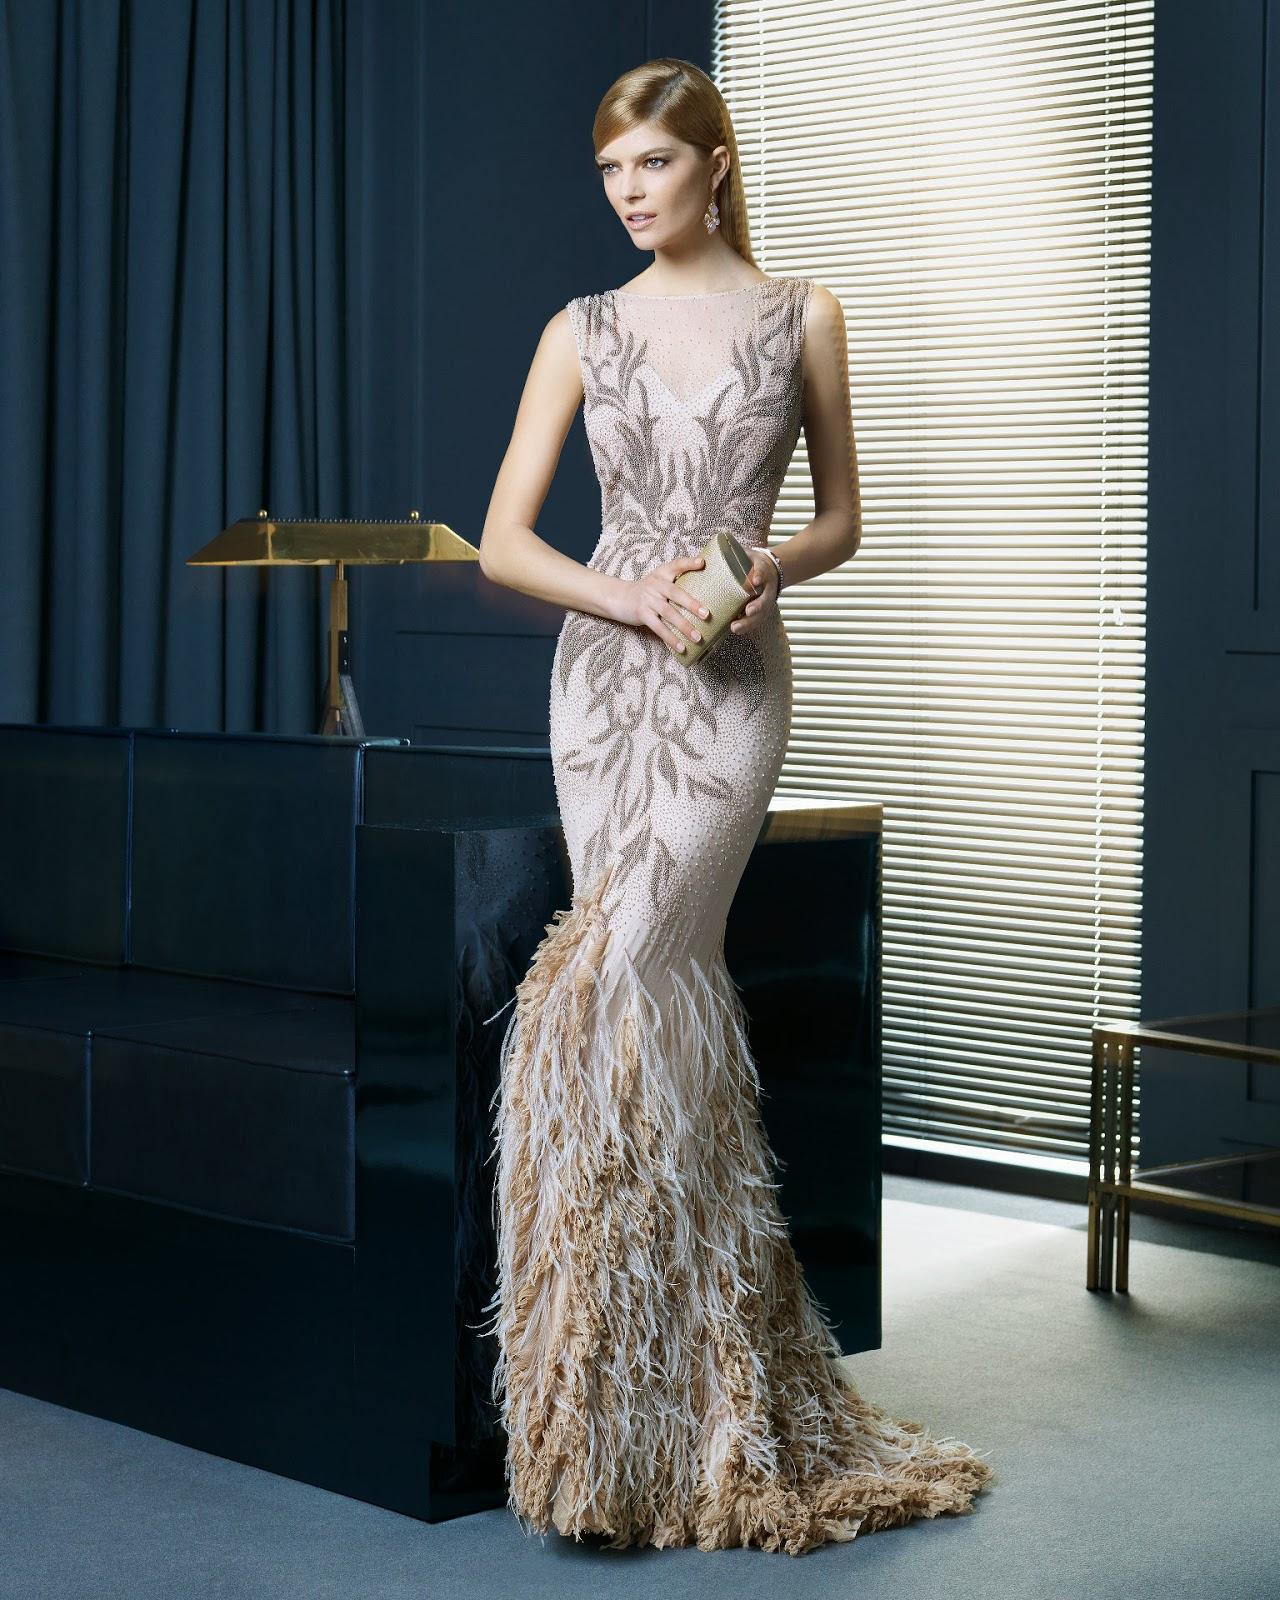 Pictures gece elbise modelleri 2013 uzun dekolteli gece elbise modeli - 2014 Abiye Modelleri